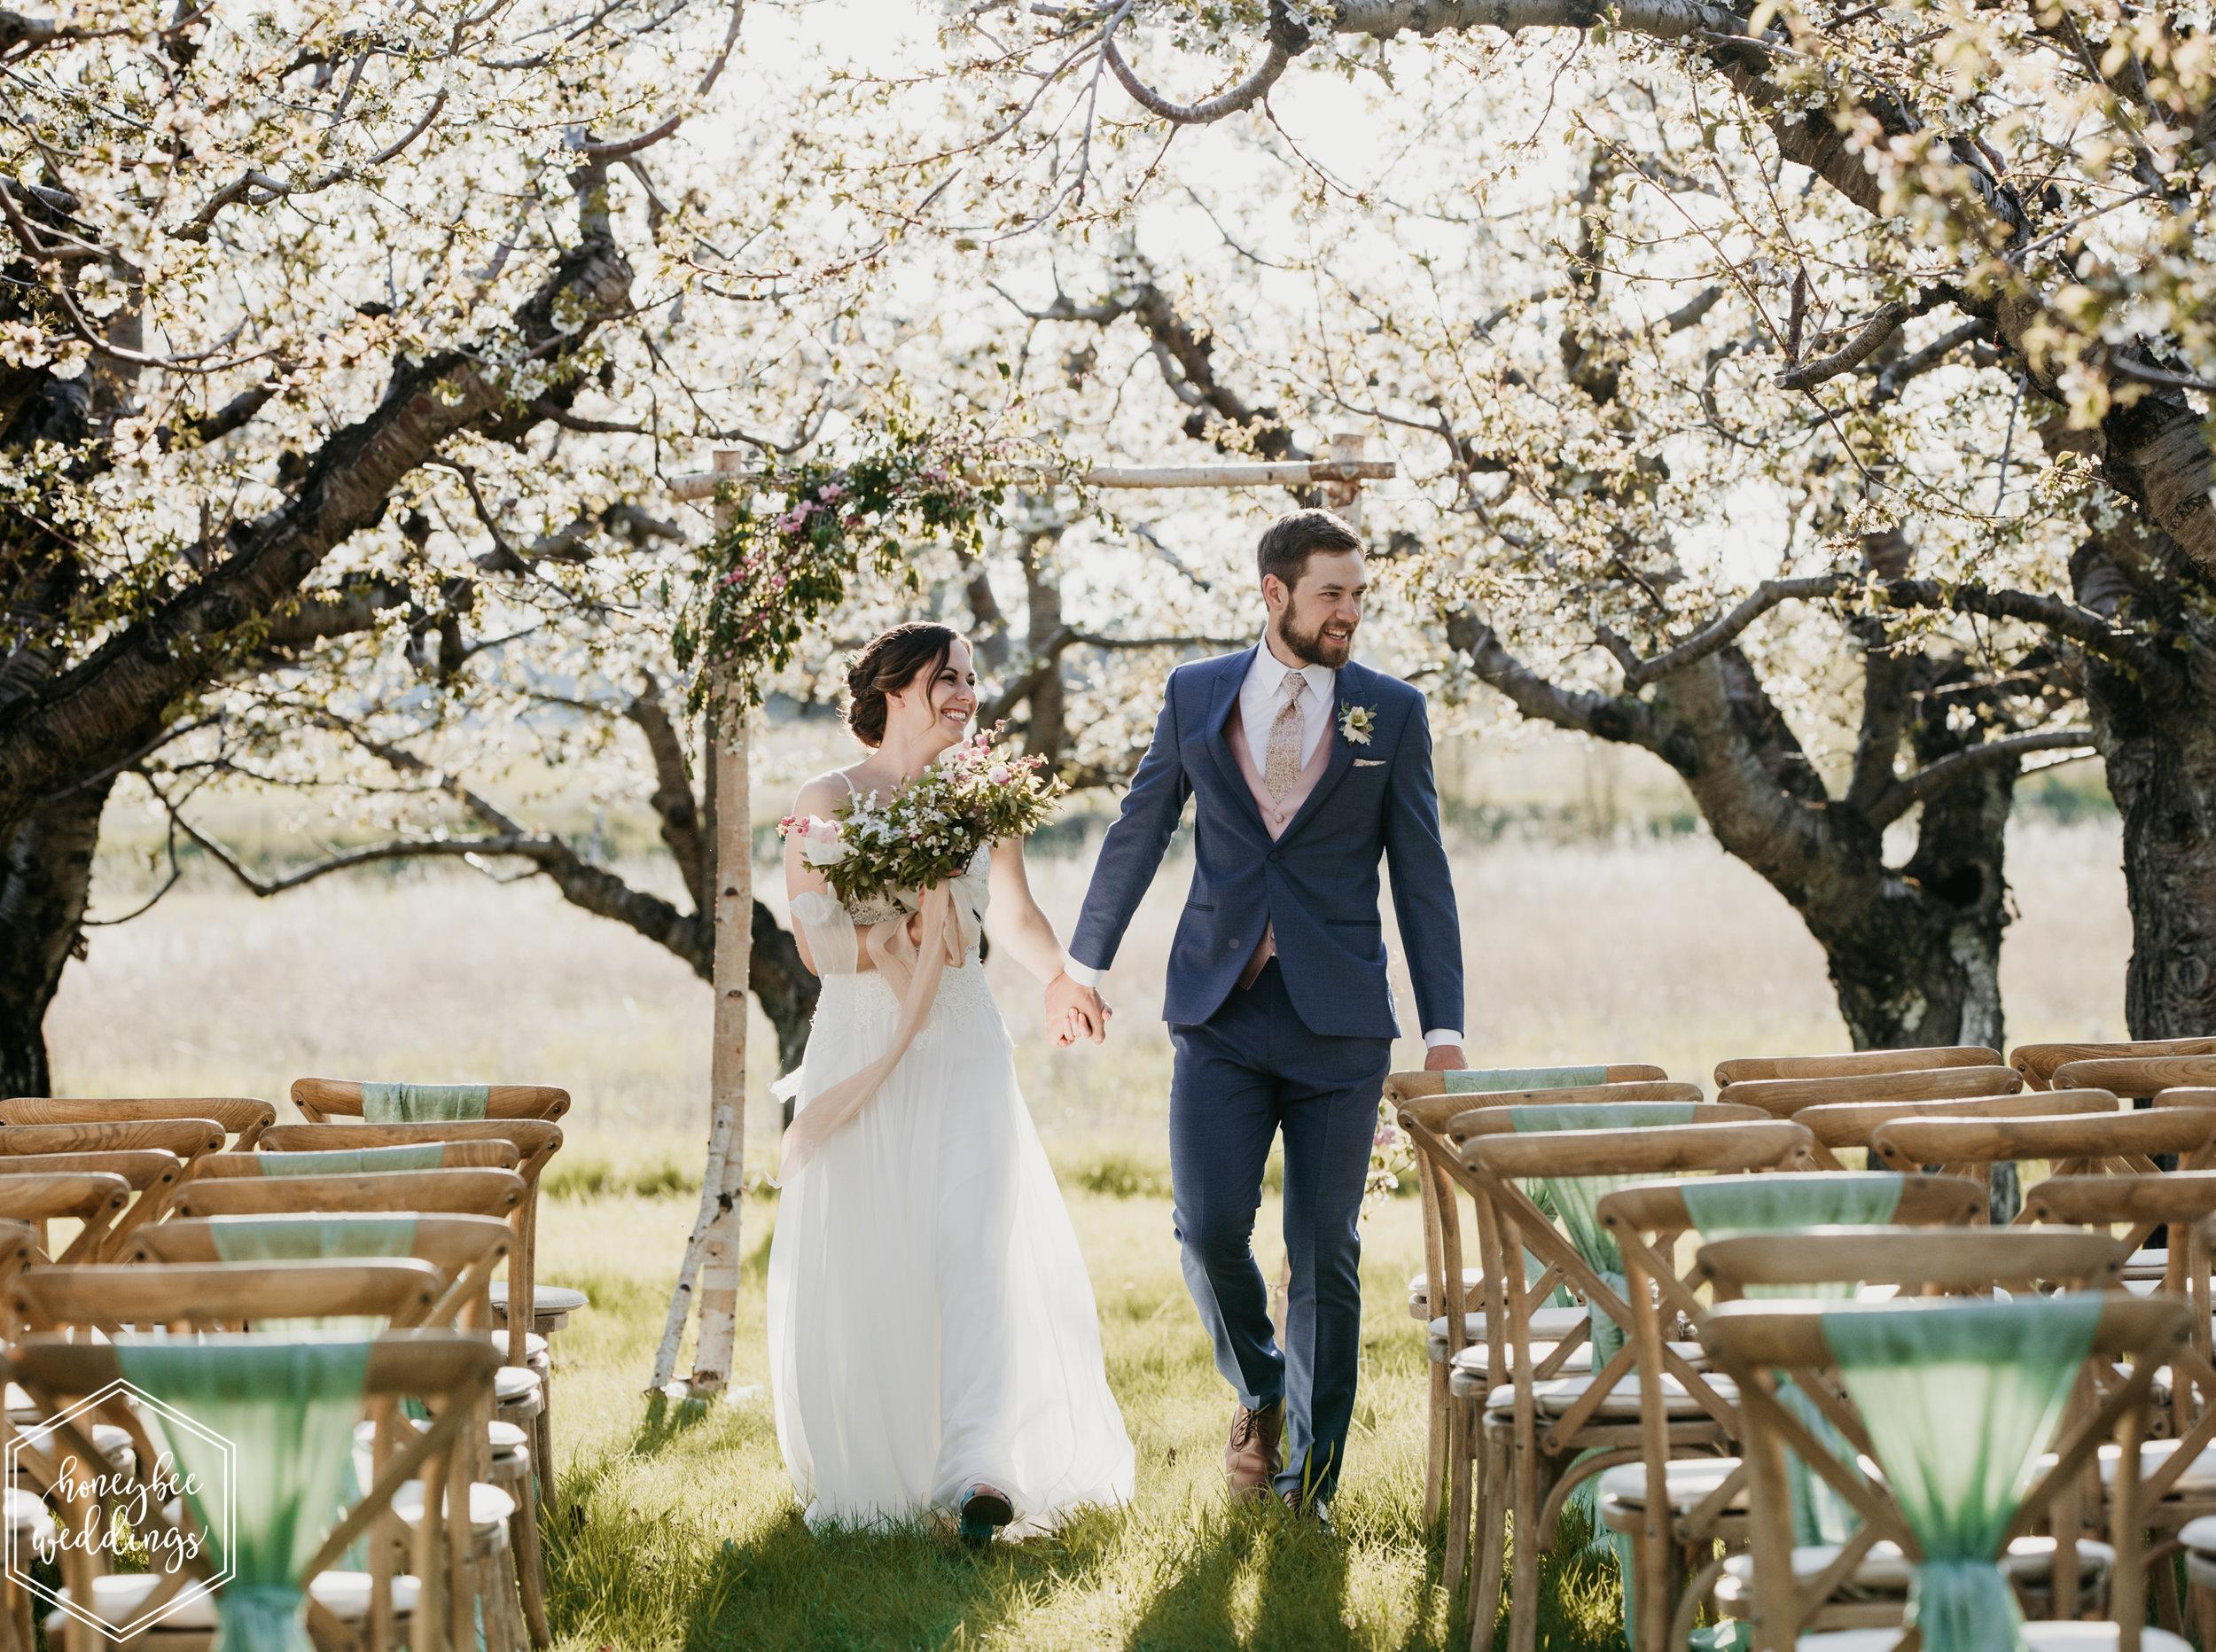 051Cherry Blossom Wedding_Styled Photoshoot_Honeybee Weddings_May 11, 2019-420.jpg